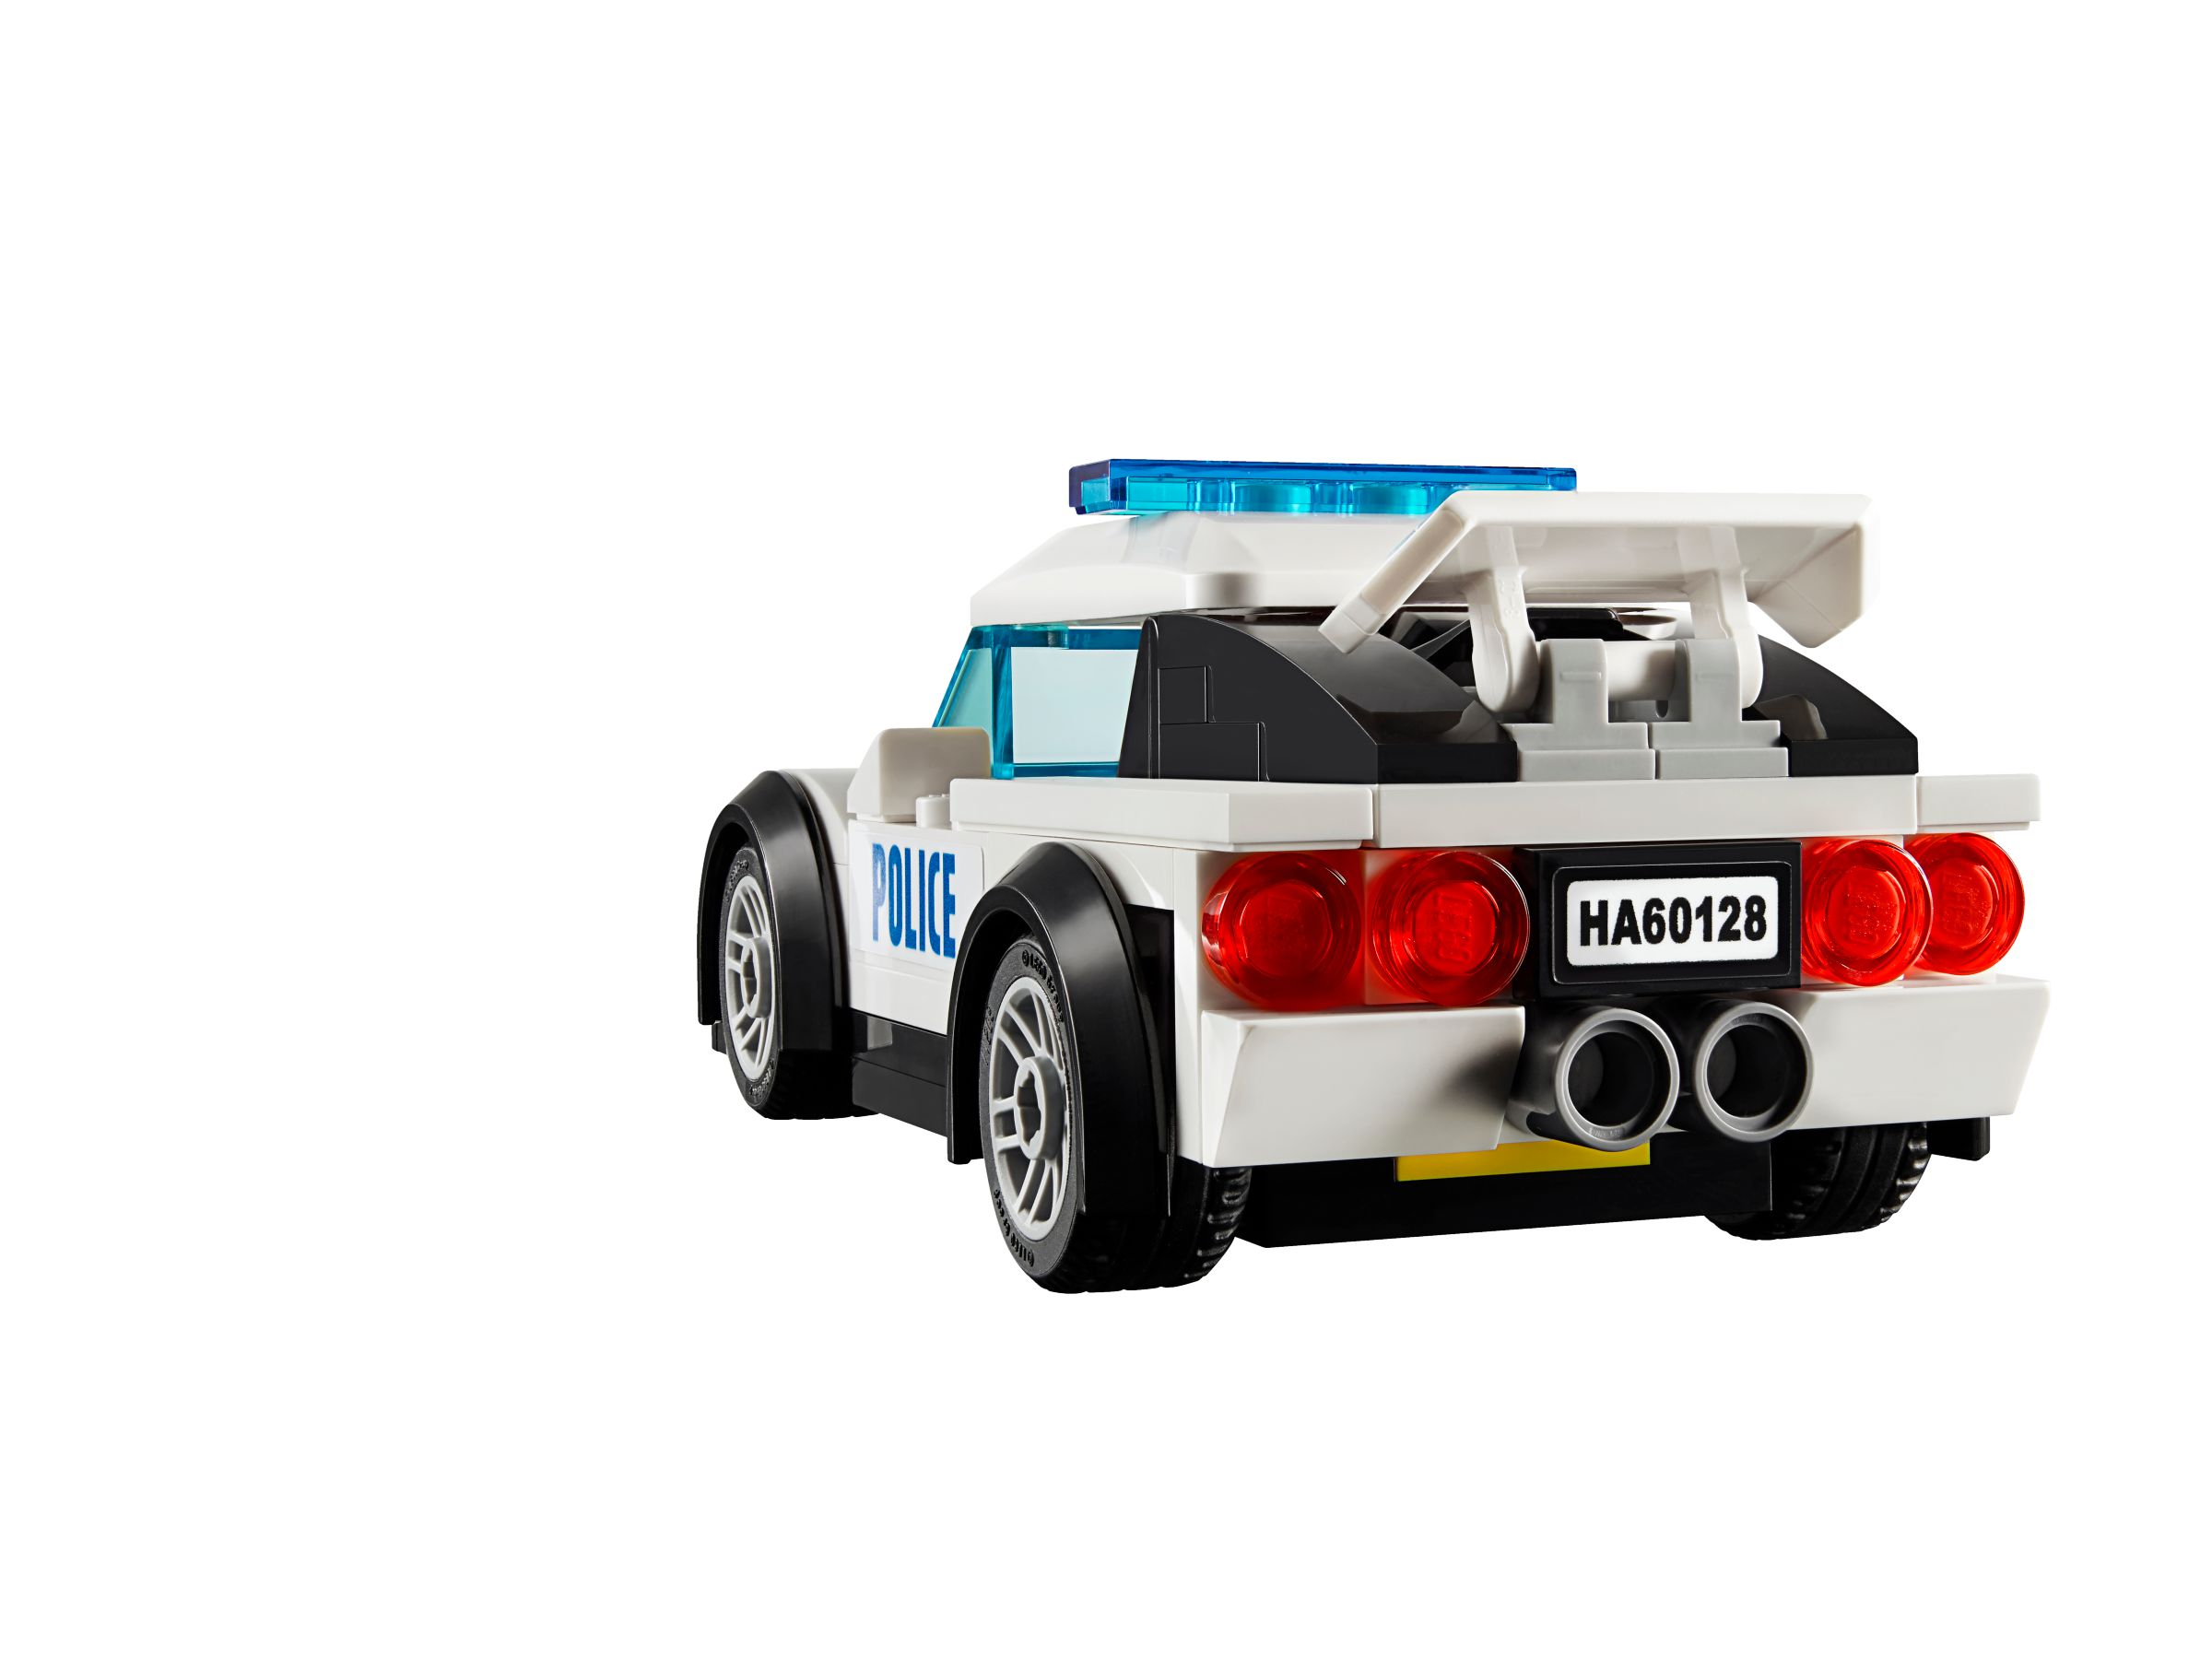 lego 60128 polizei verfolgungsjagd city 2016 police pursuit brickmerge. Black Bedroom Furniture Sets. Home Design Ideas